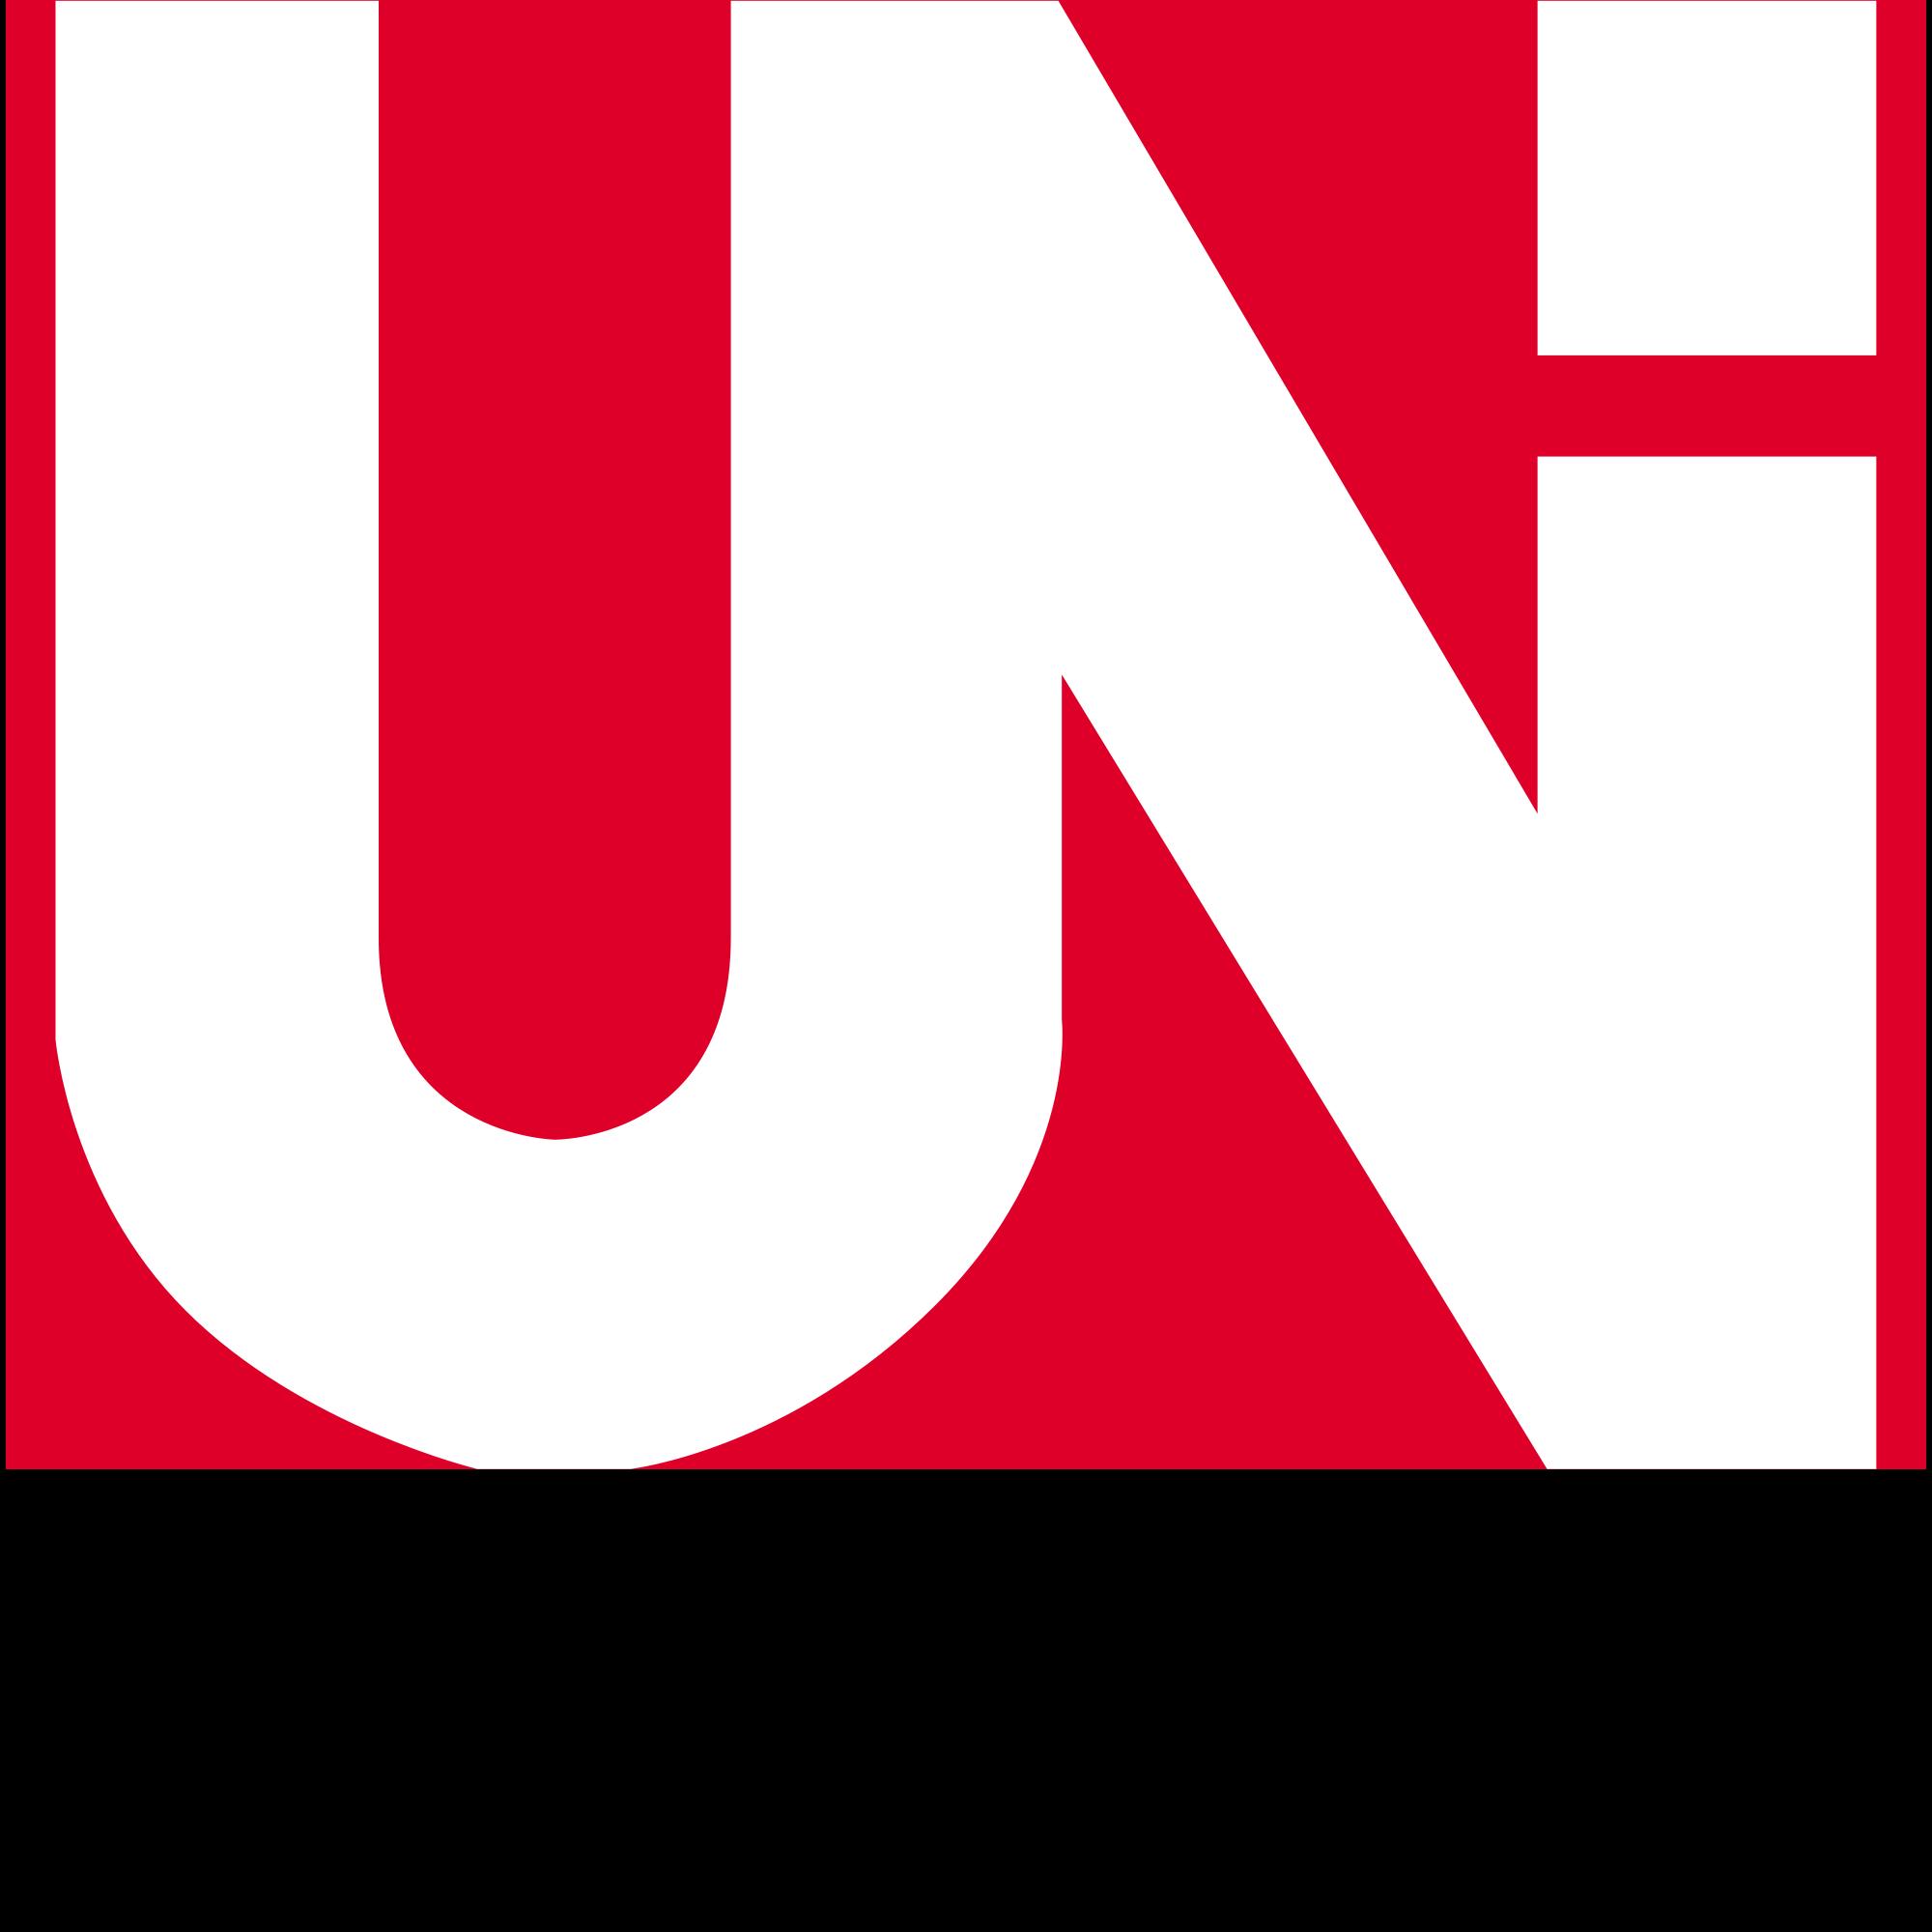 Unicode 6.0.0 und »Symbojet«